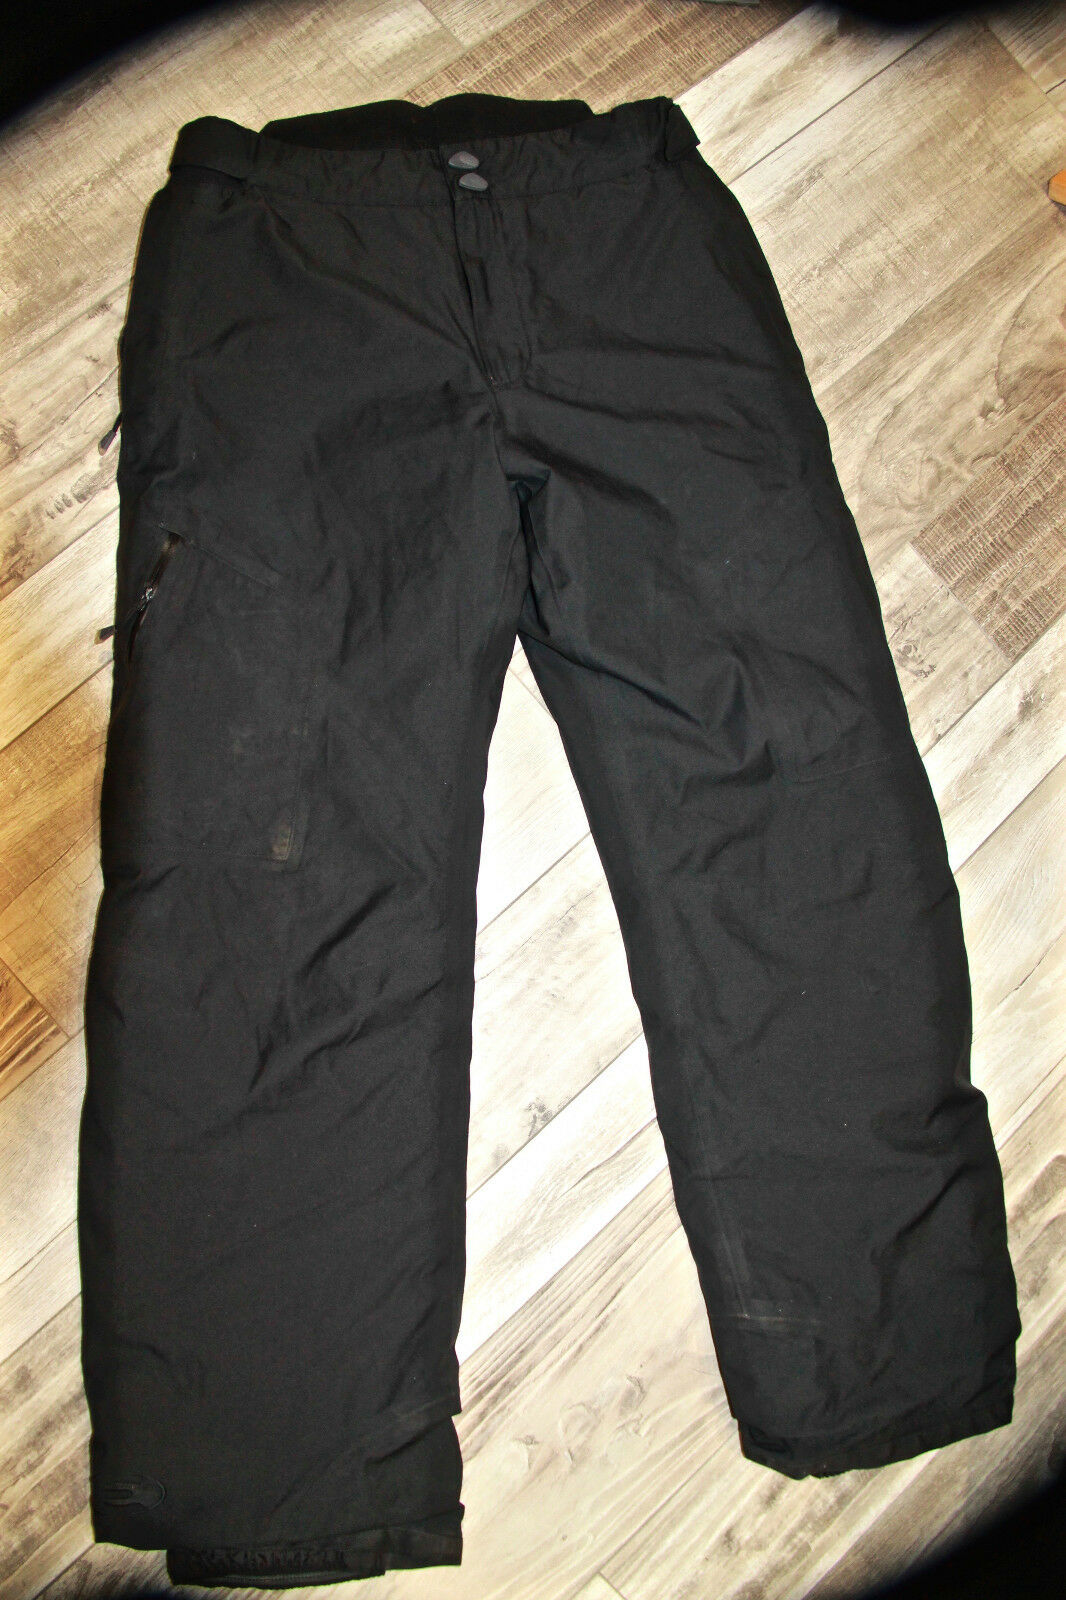 Joli pantaloni snowboard sci nero EIDER EIDER EIDER kiwano taglia XL lungo fa2ed4